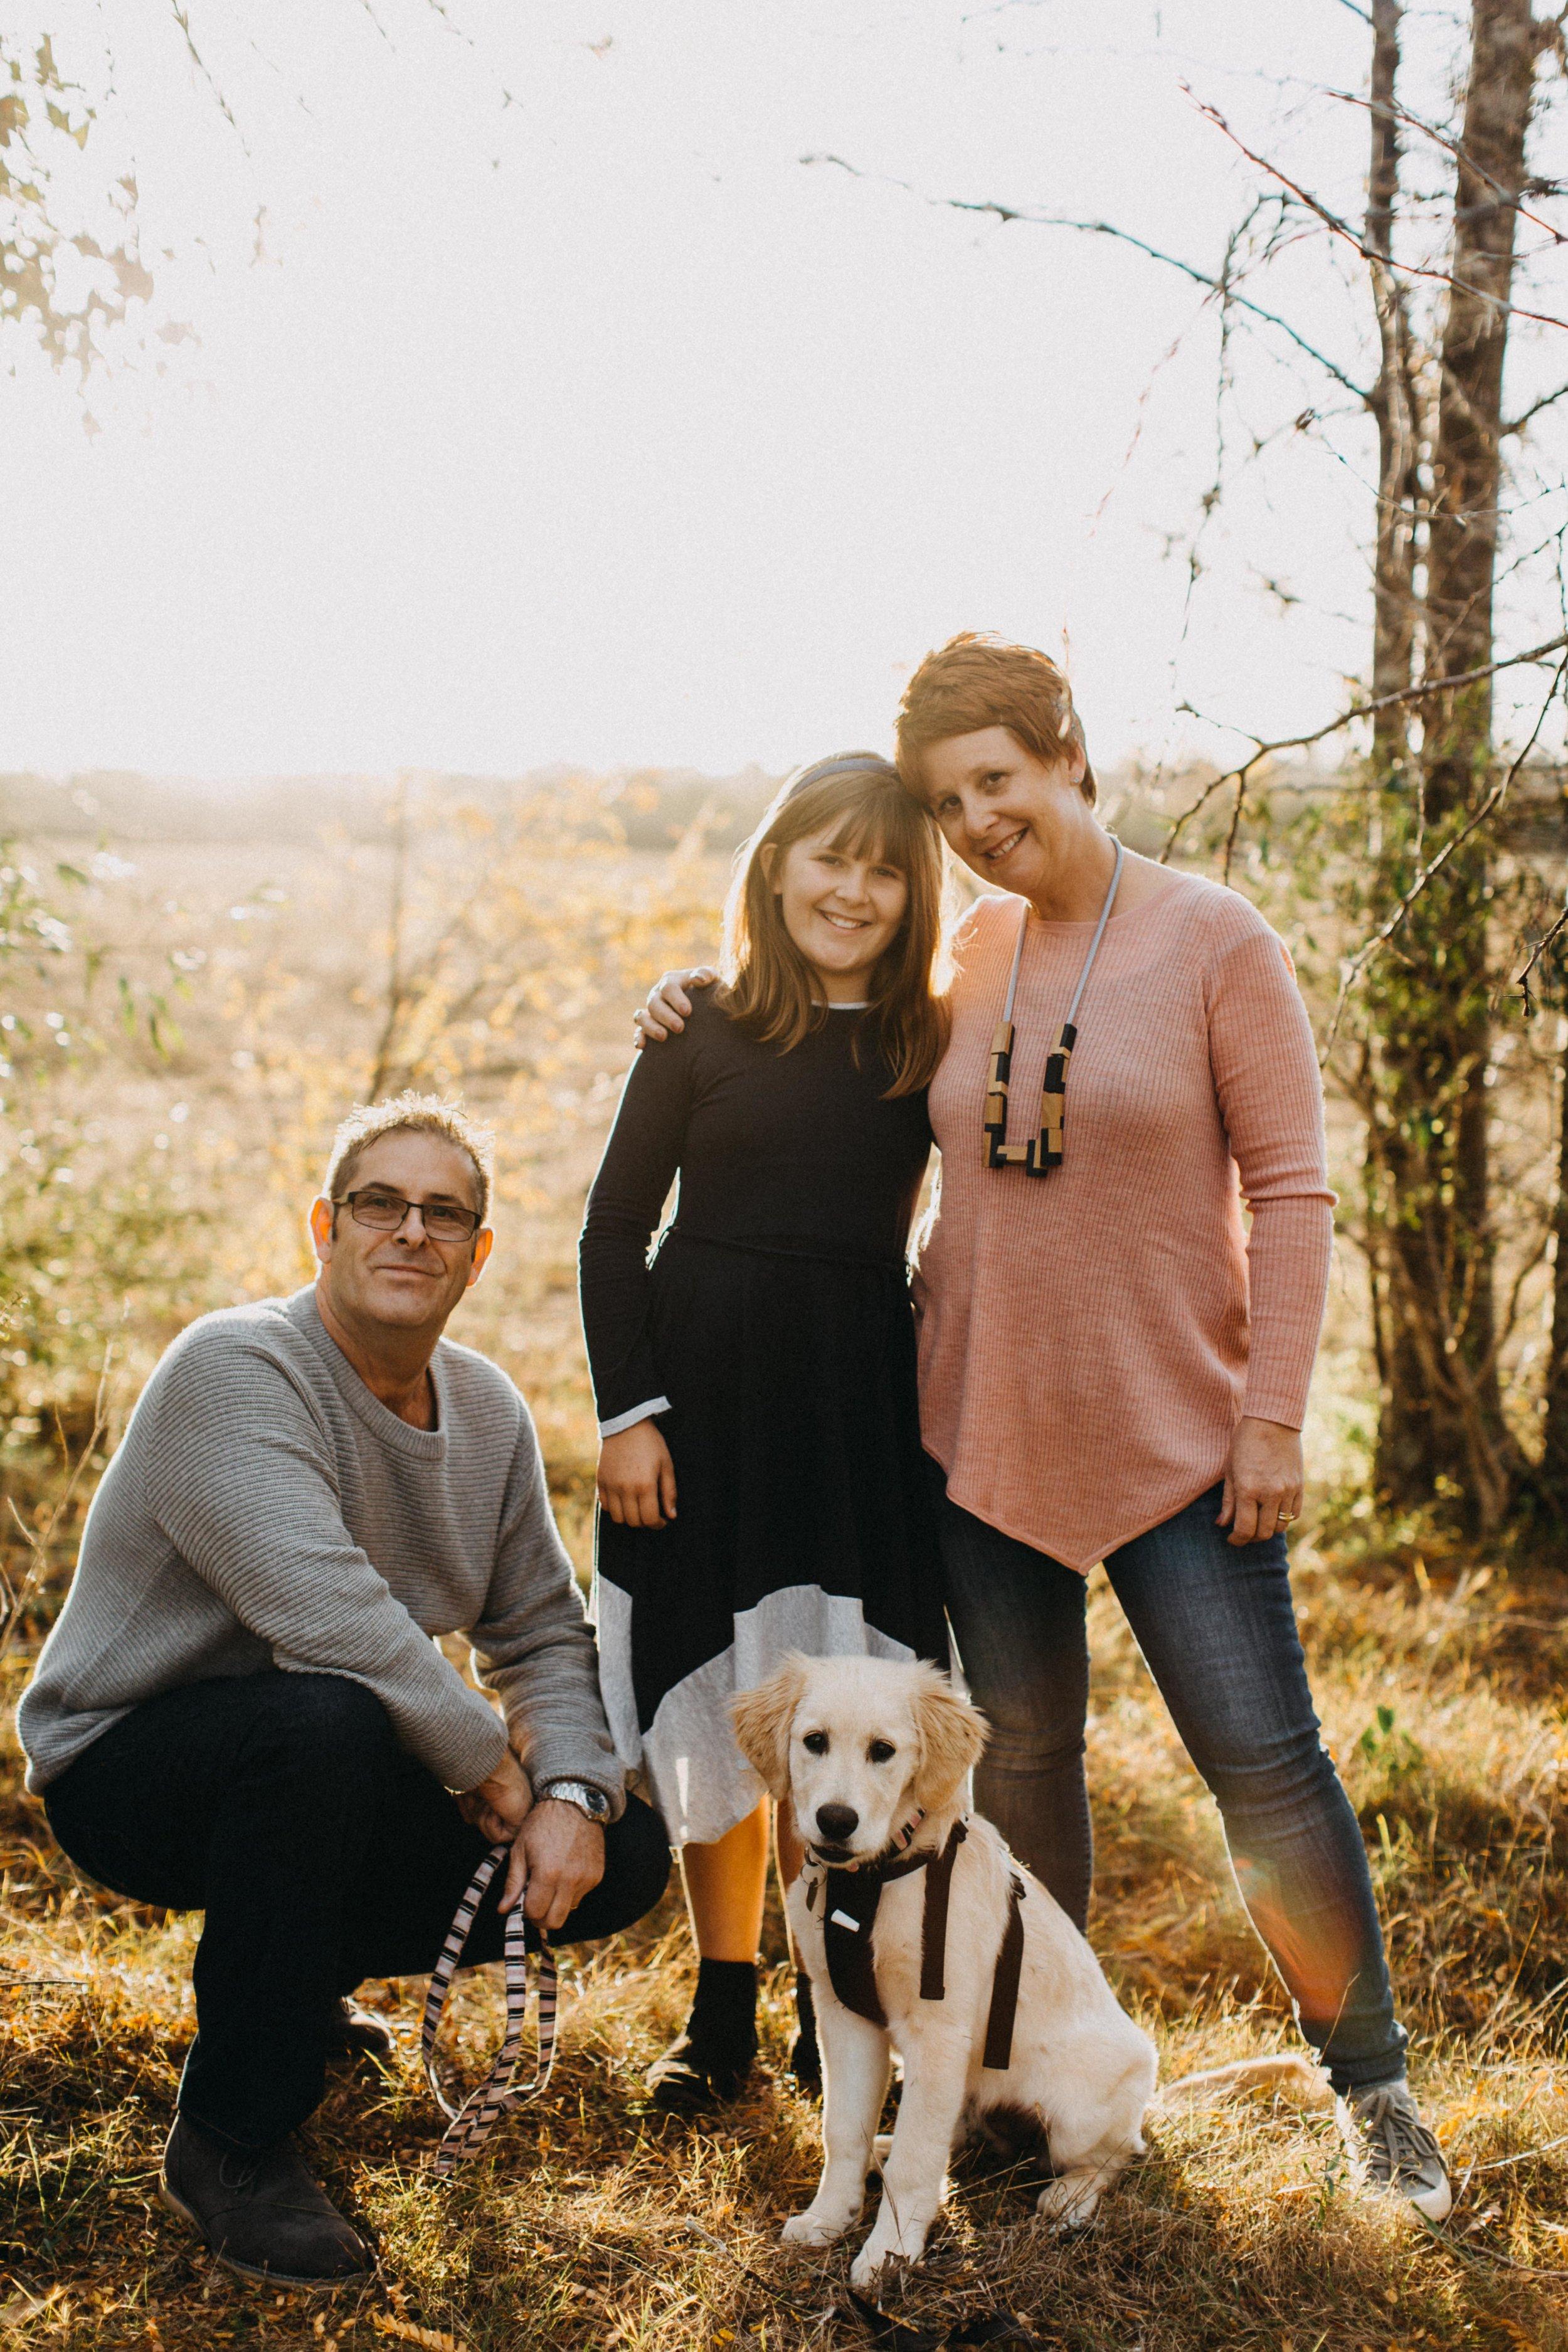 camden-macarthur-family-photography-www.emilyobrienphotography.net-1.jpg